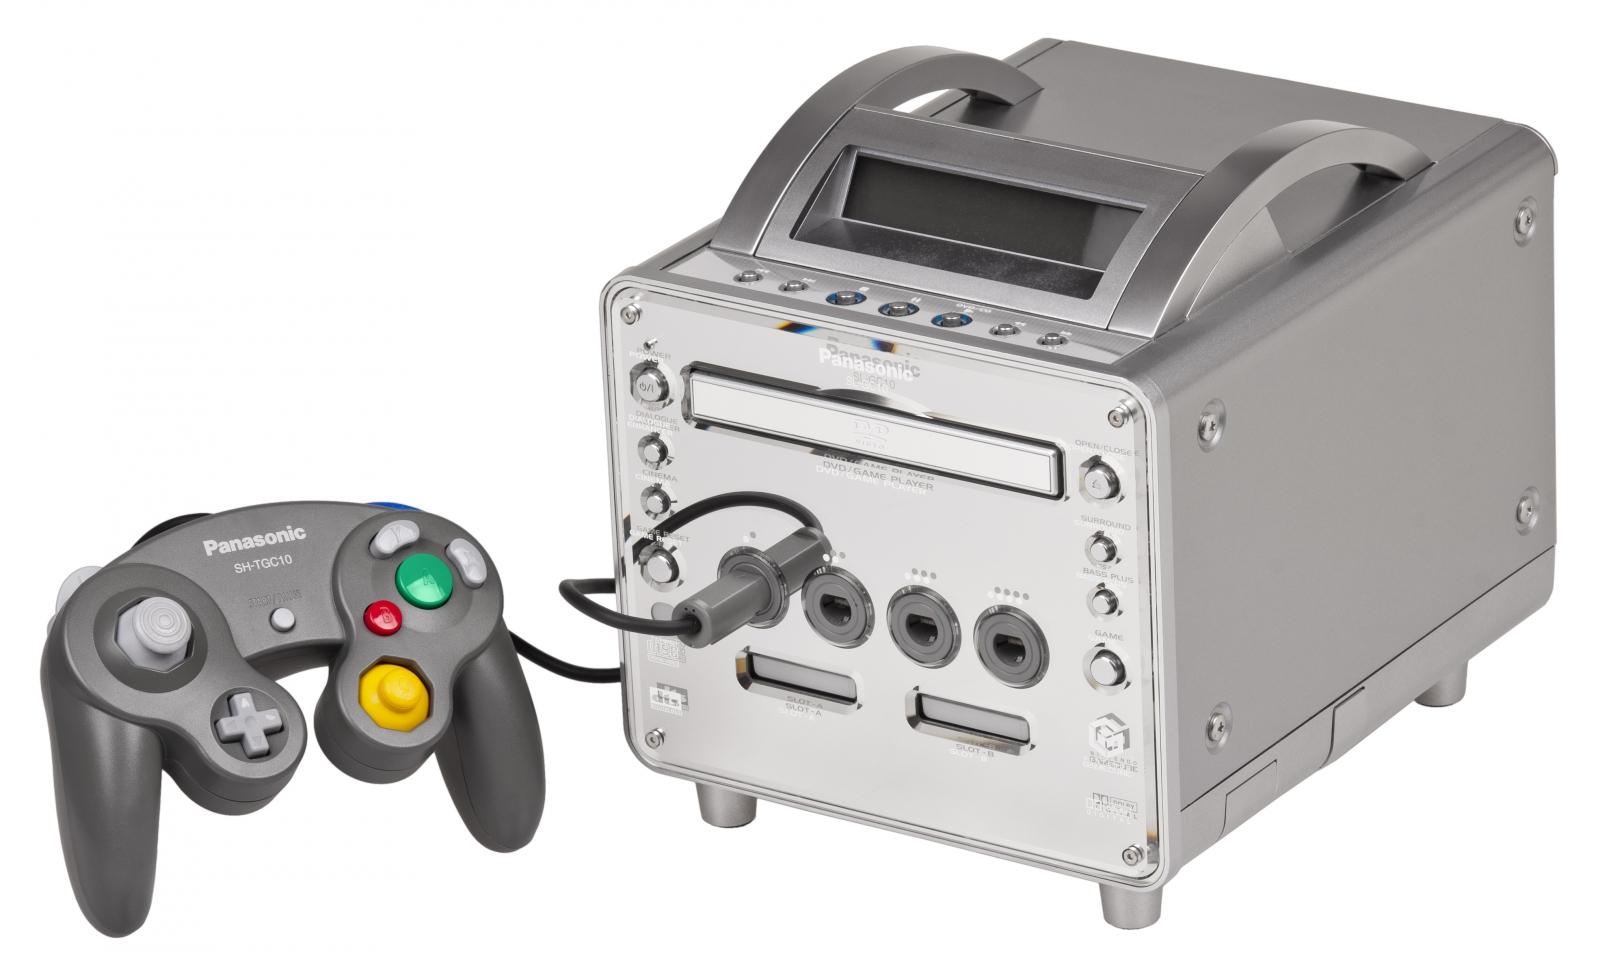 Panasonic Q GameCube